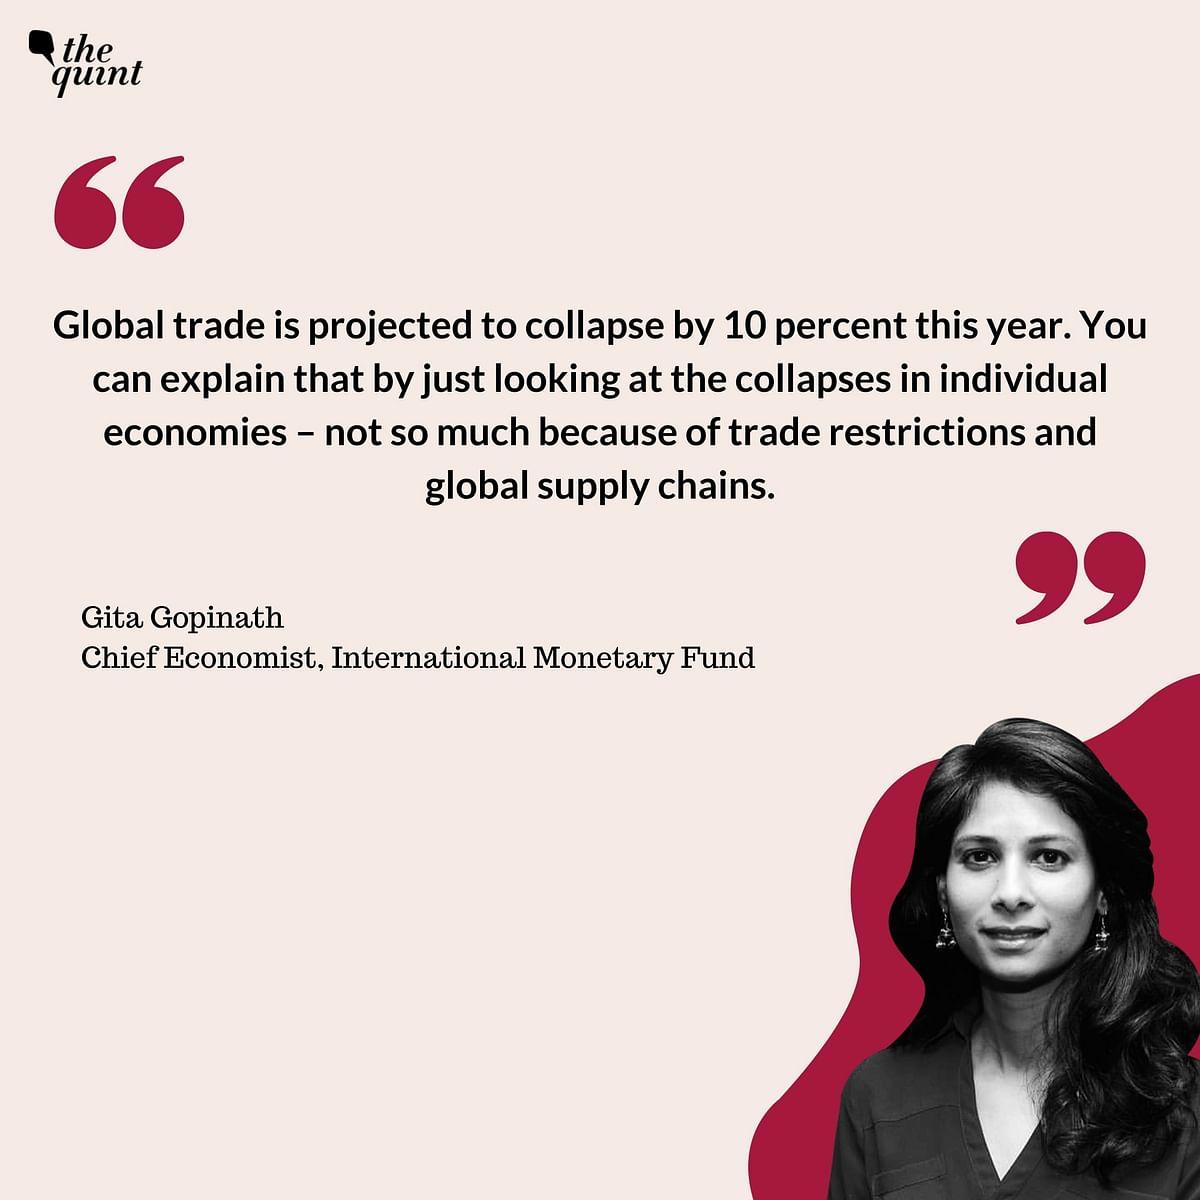 Indian Economy Won't Reach 2019 Levels Before 2022: Gita Gopinath